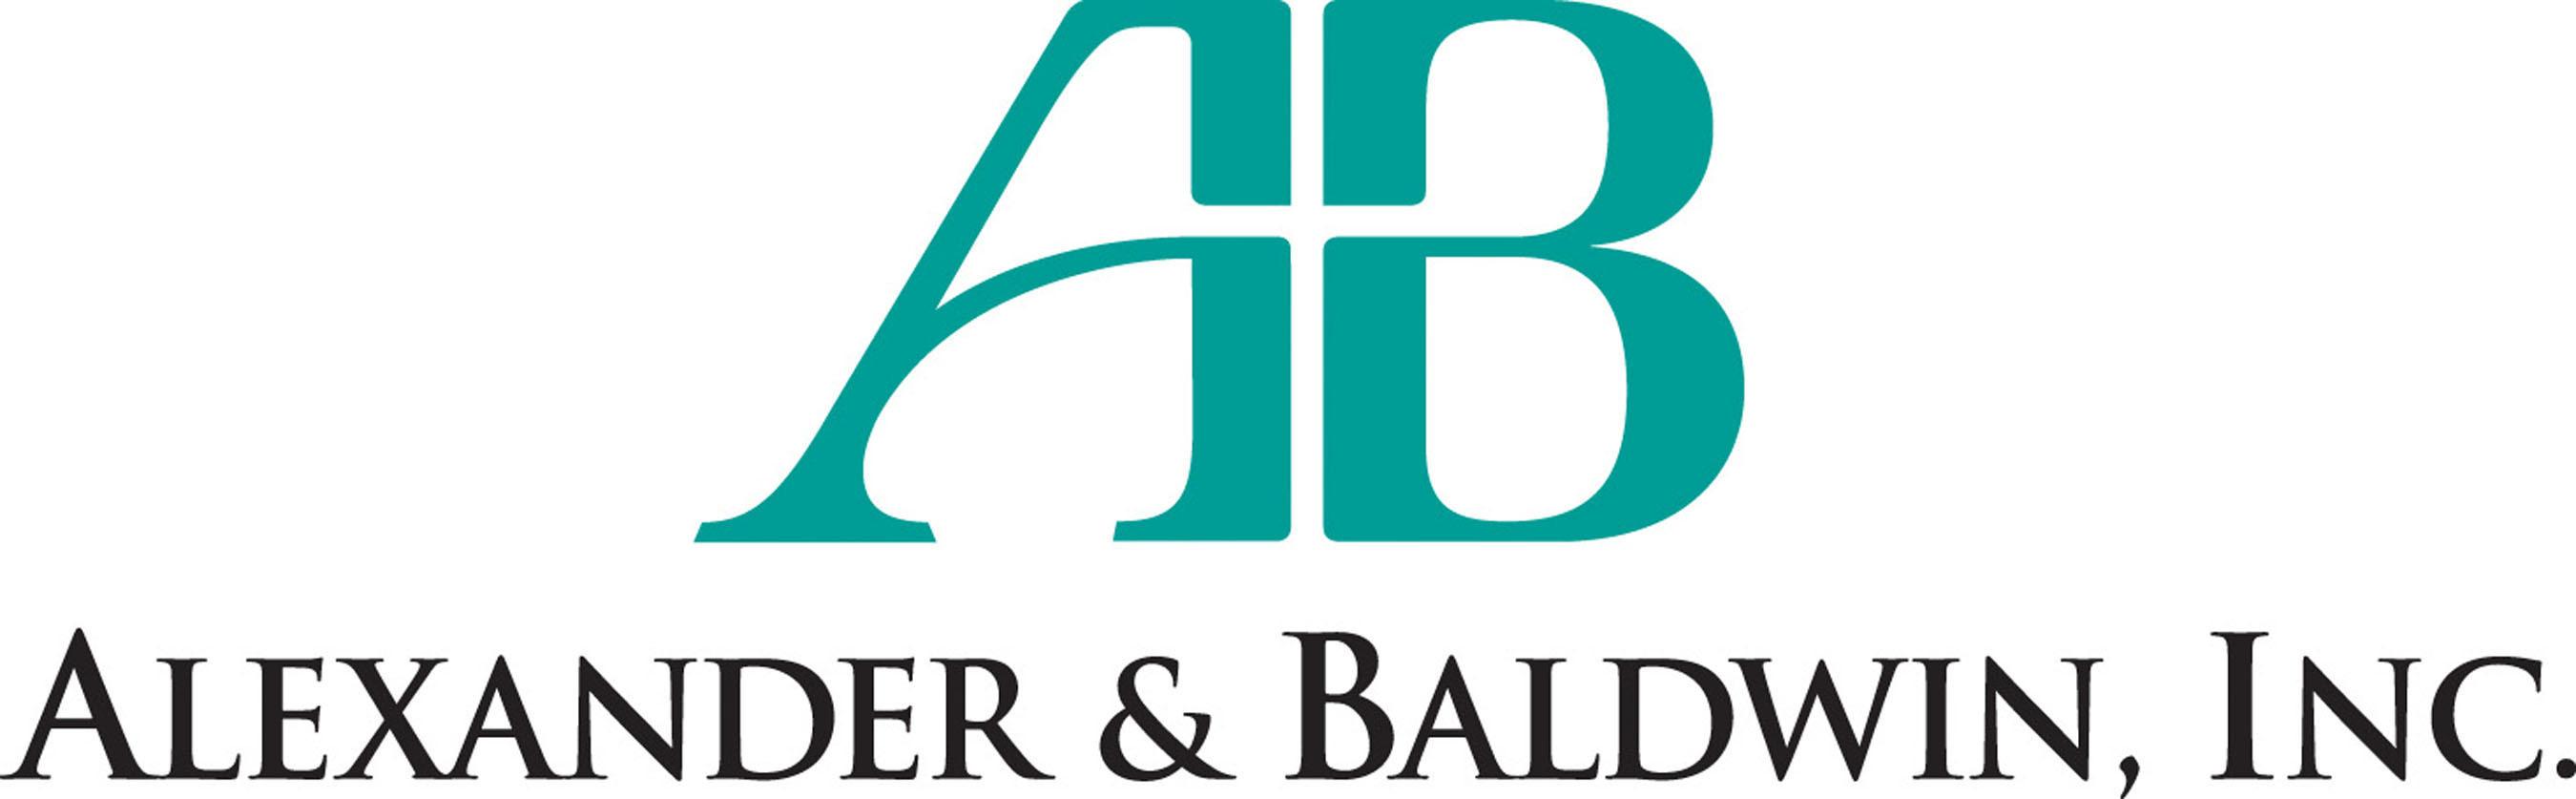 Alexander & Baldwin, Inc. Logo.